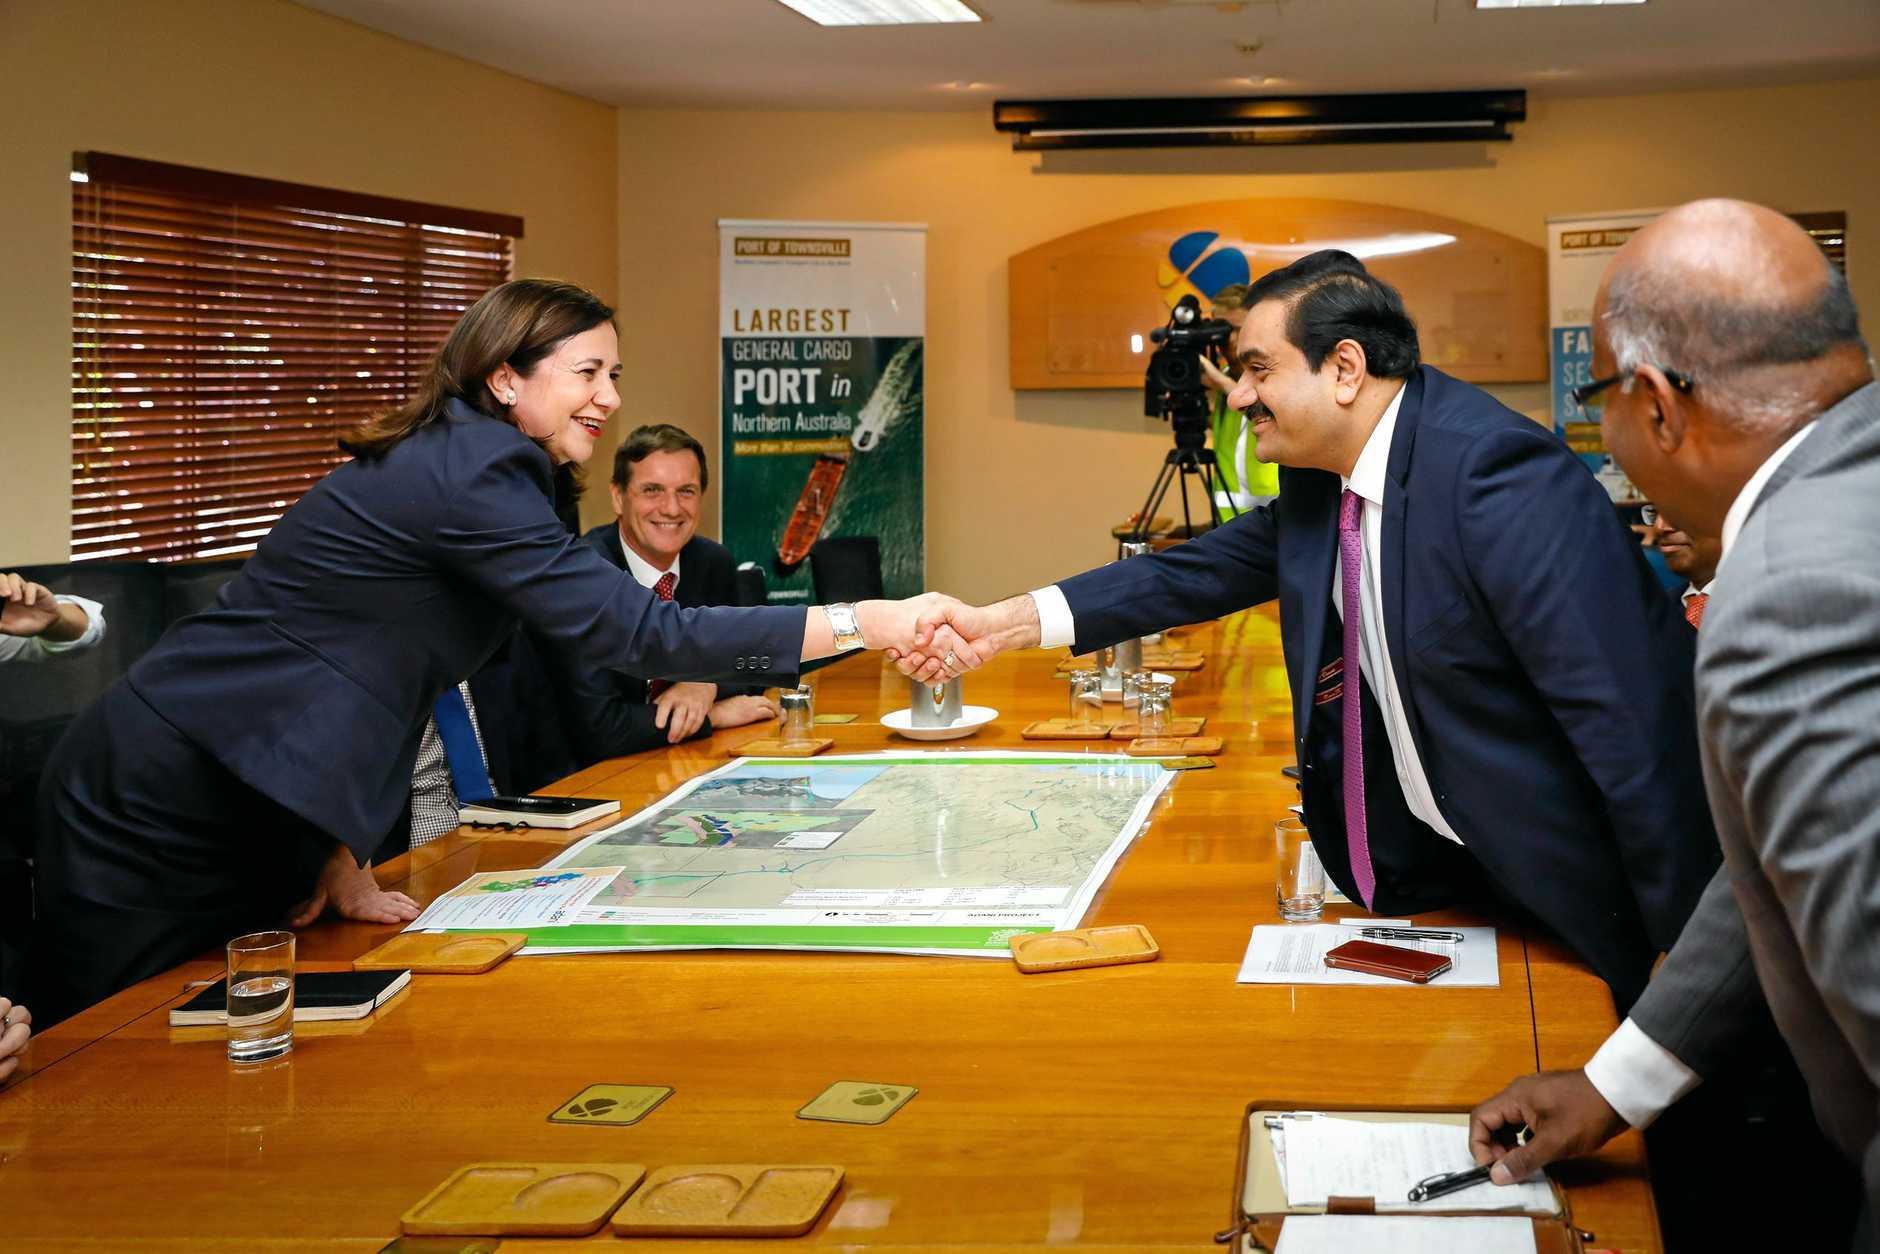 Adani Group chairman Gautam Adani meets with Queensland premier Annastacia Palaszczuk at the Port of Townsville in 2016.